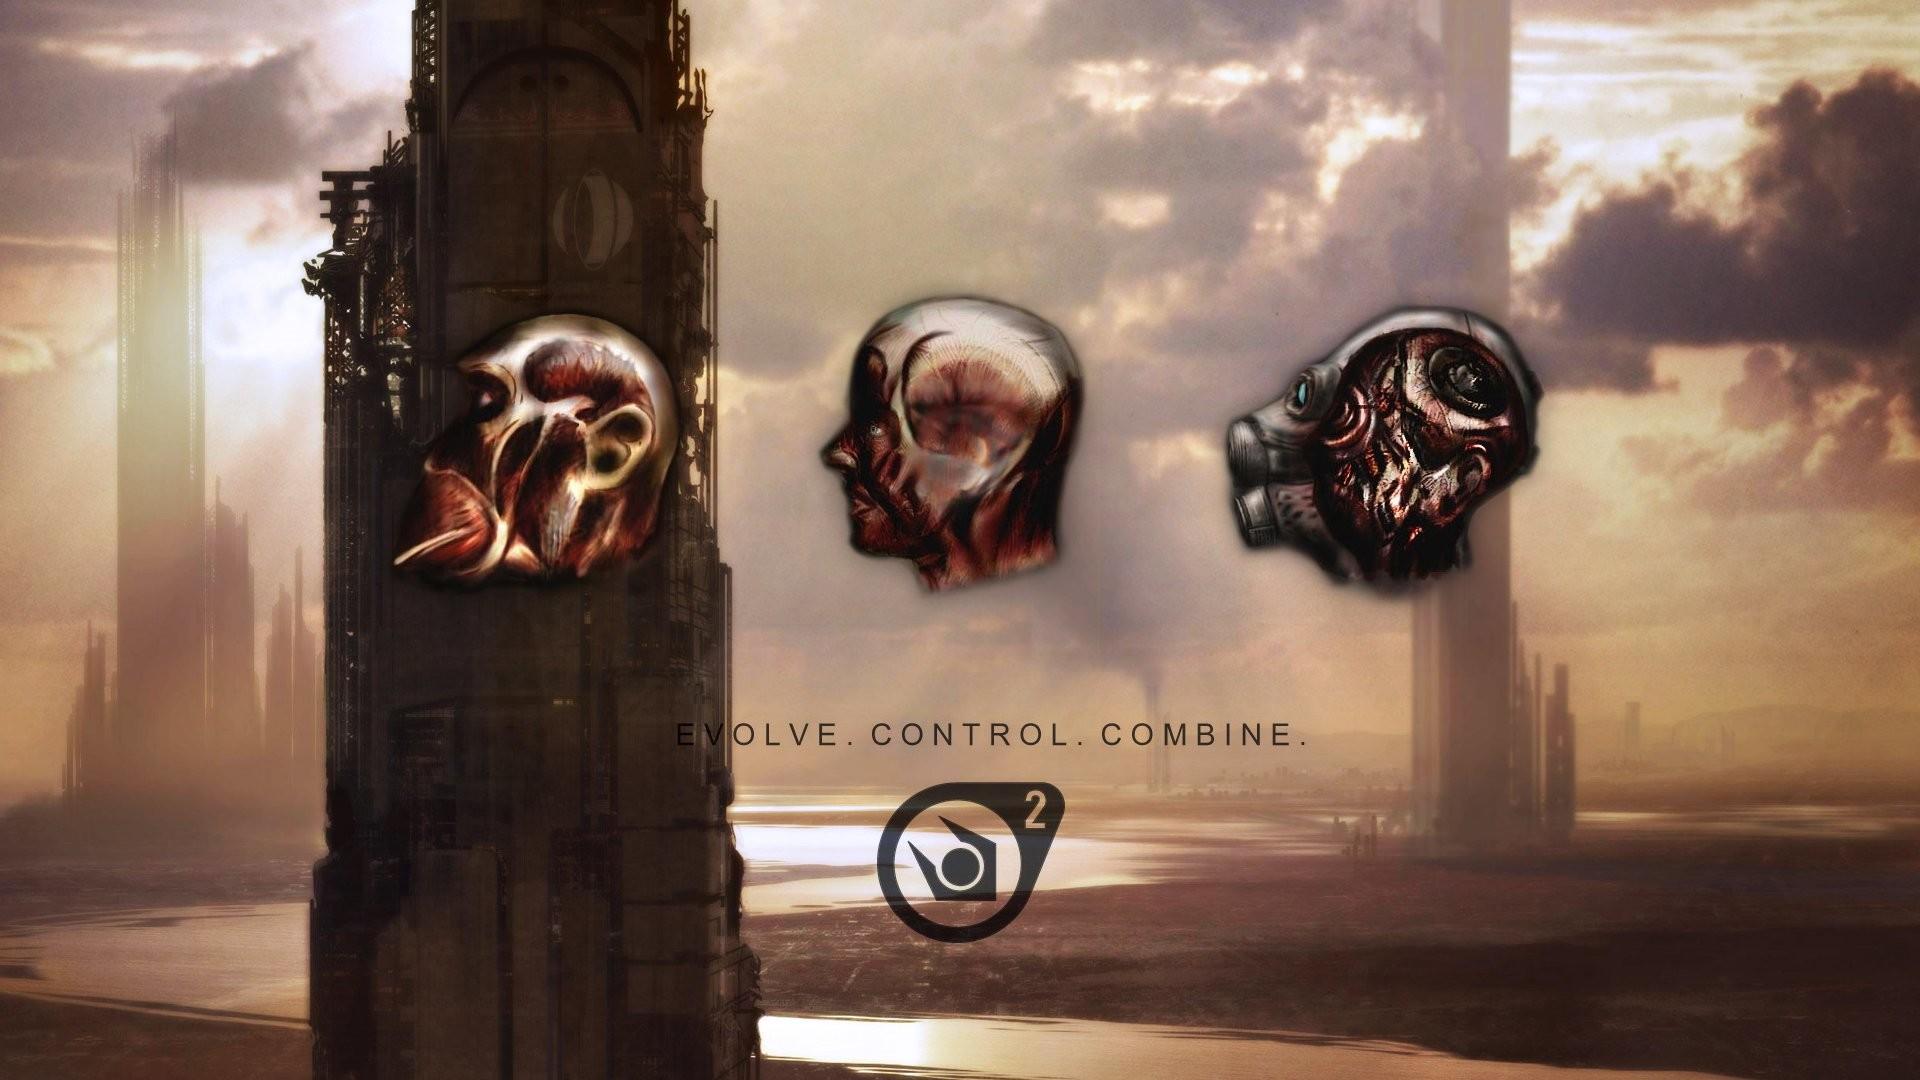 Half Life 2 Combine …